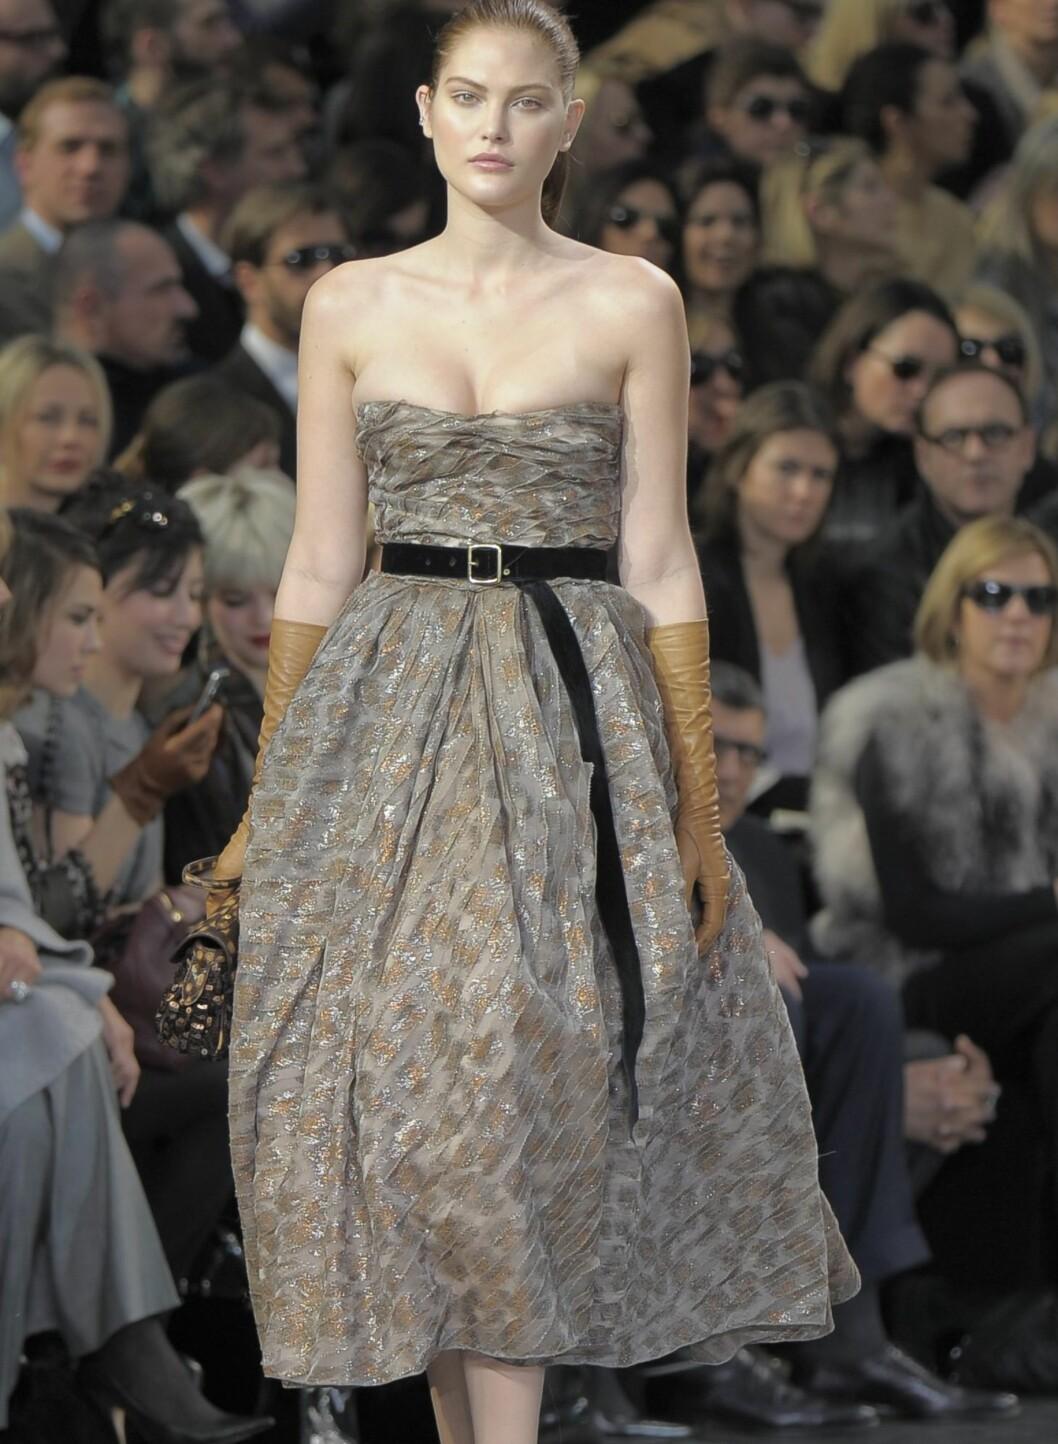 Kjole som gir timeglassfigur signert Louis Vuitton. Foto: All Over PressAll Over Press